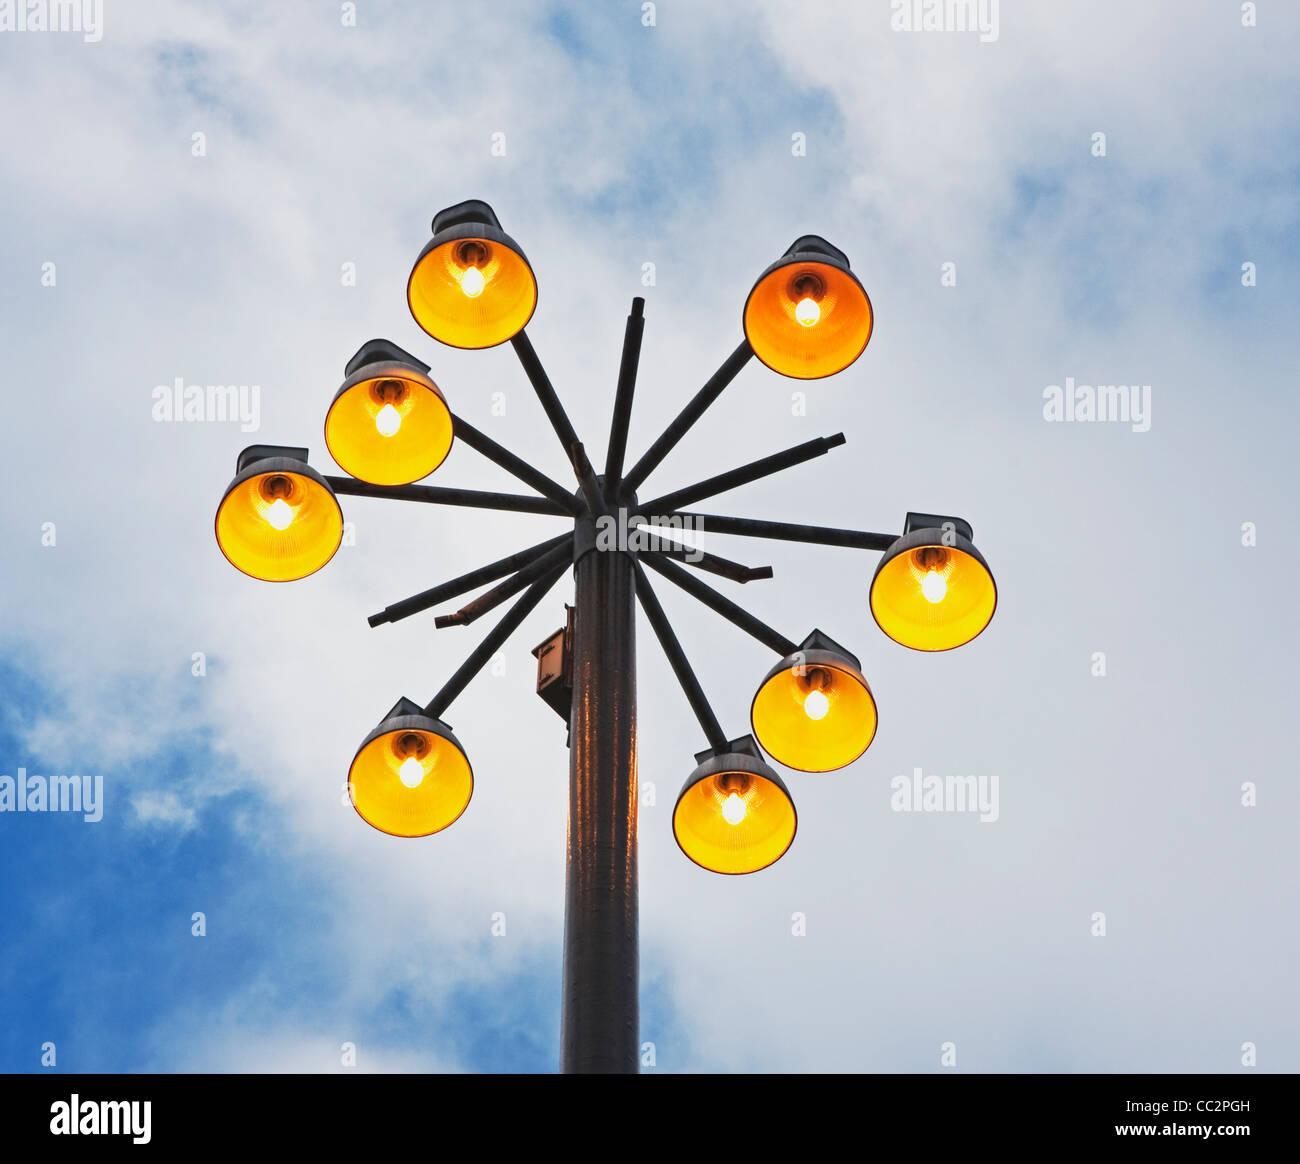 illuminating lights over sports field - Stock Image